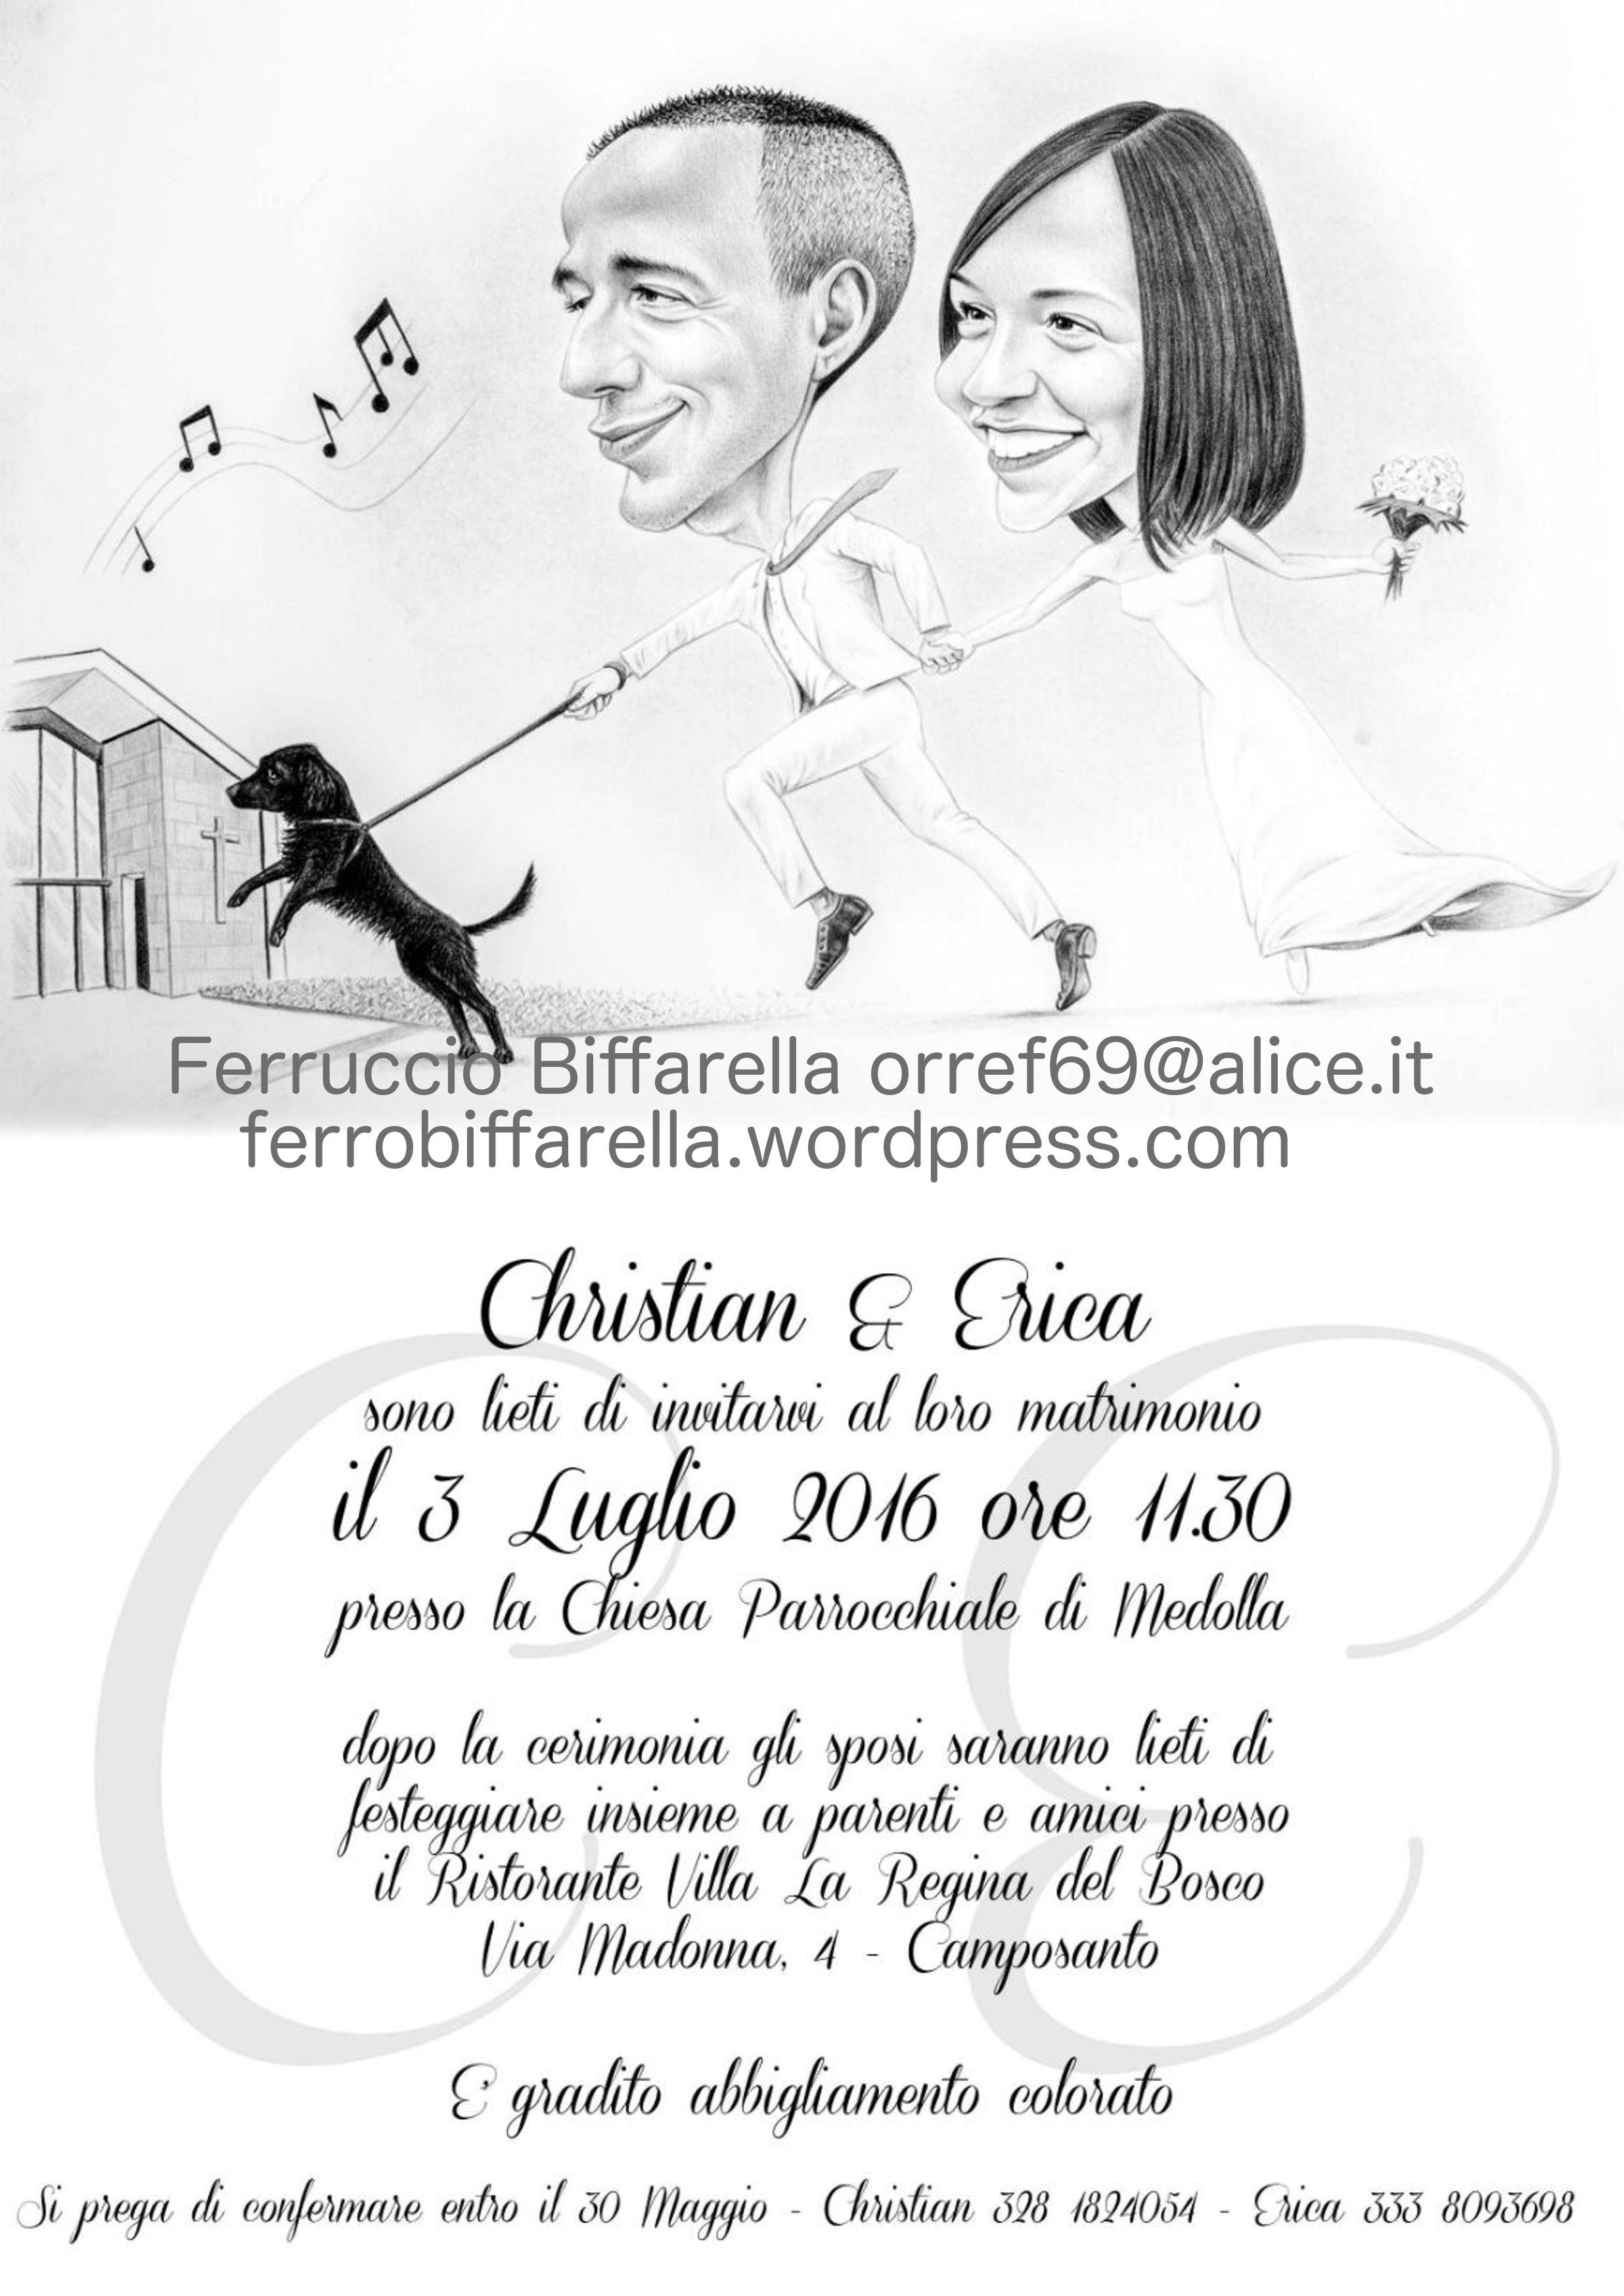 Partecipazioni Matrimonio Caricature.Christian Erica Inviti Nozze Partecipazioni Partecipazioni